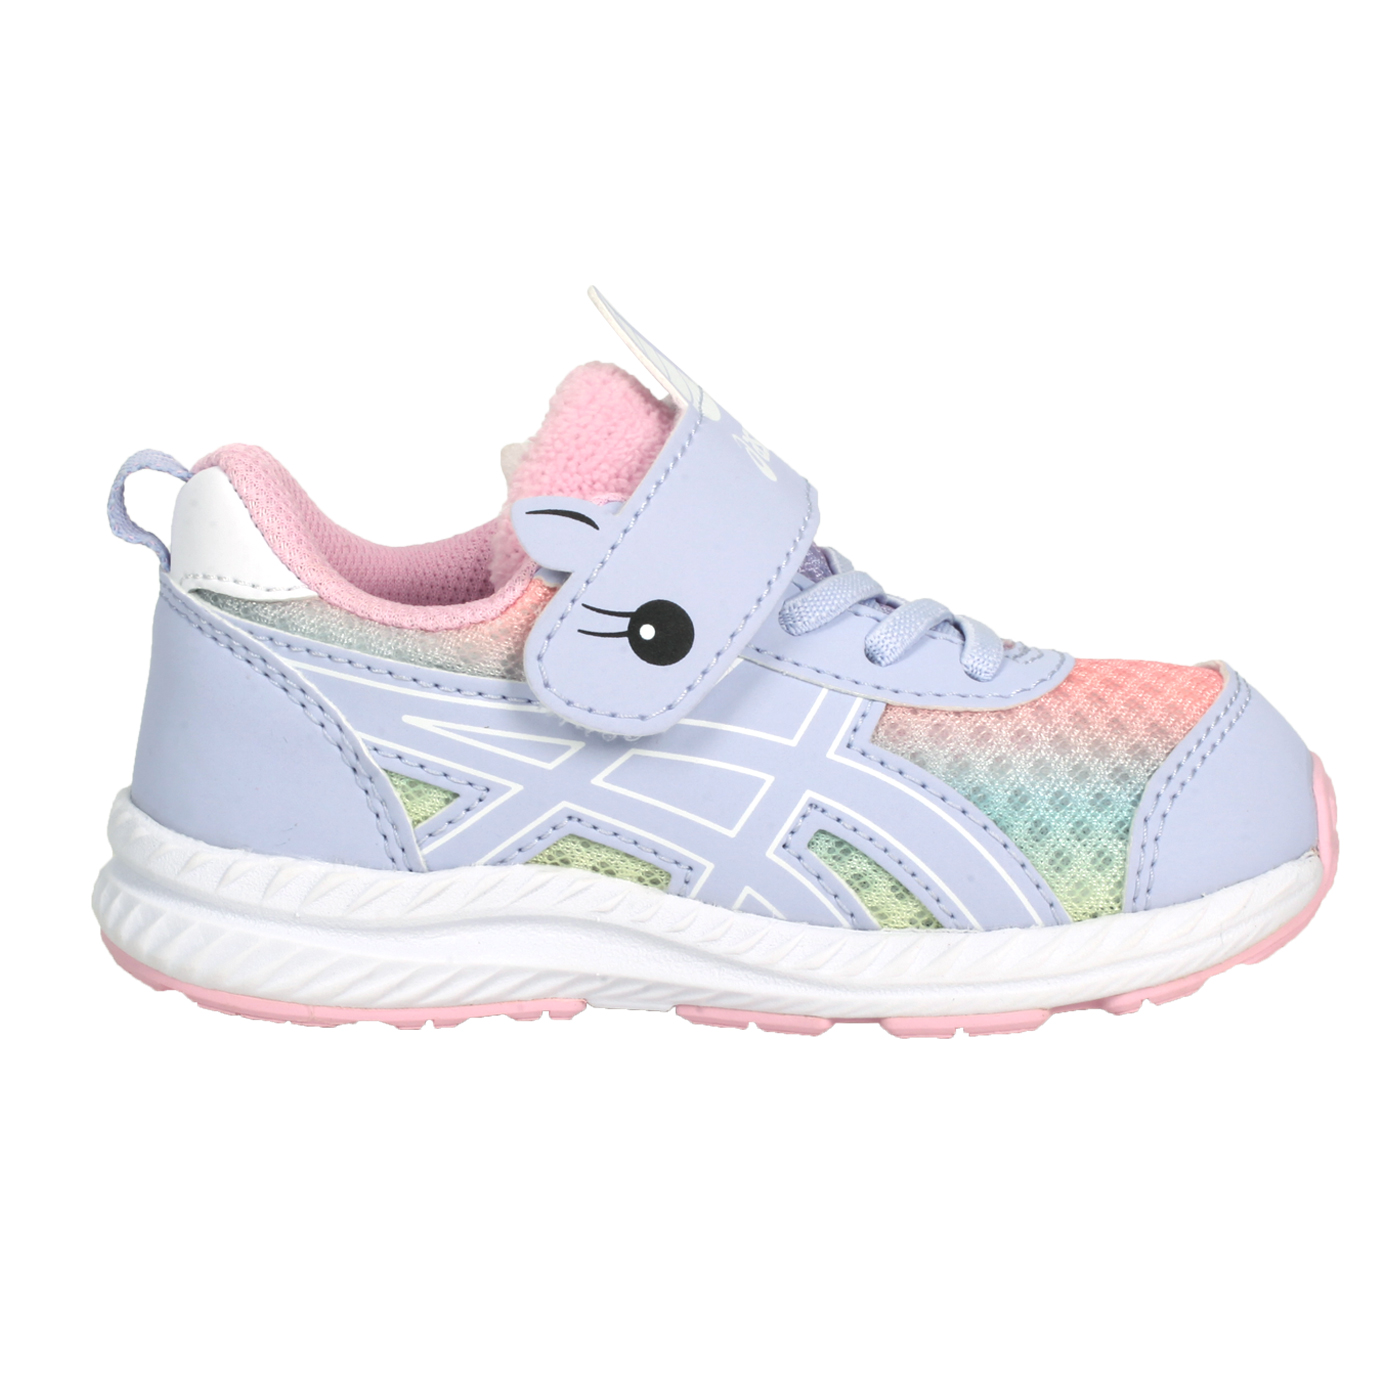 ASICS 小童慢跑鞋  @CONTEND 7 TS SCHOOL YARD@1014A202-405